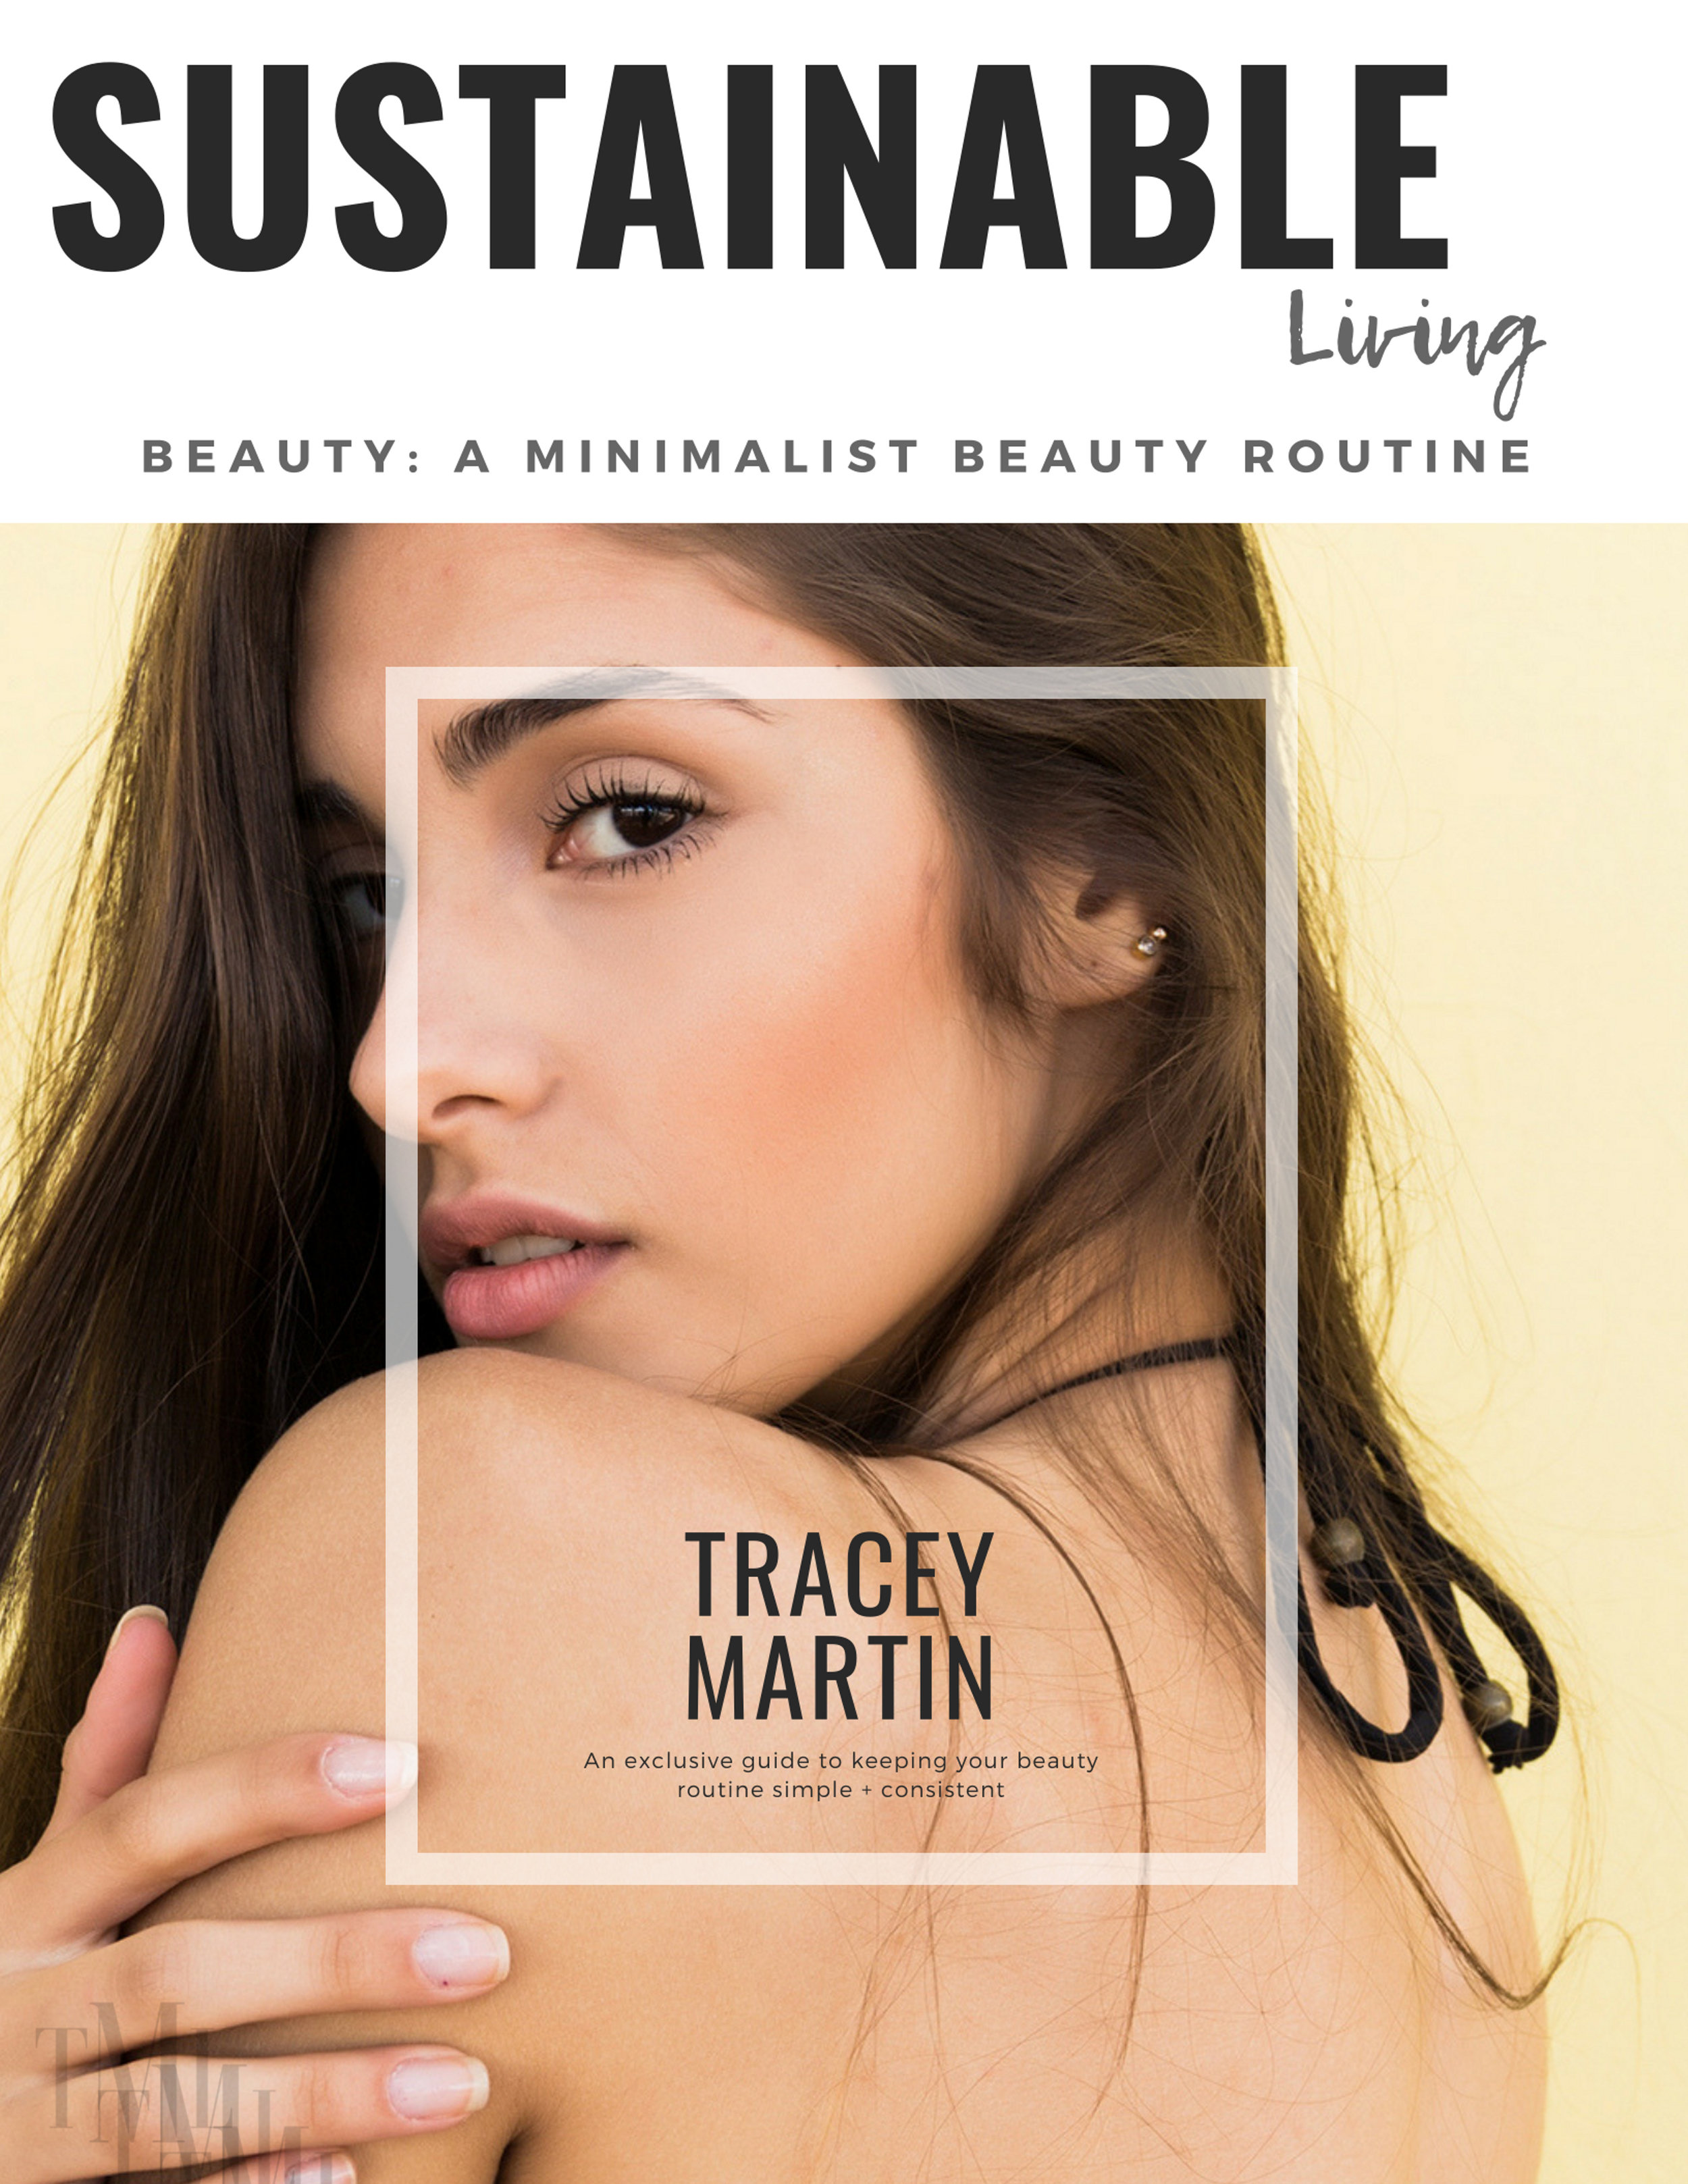 Beauty Guide - Tracey Martin.jpg